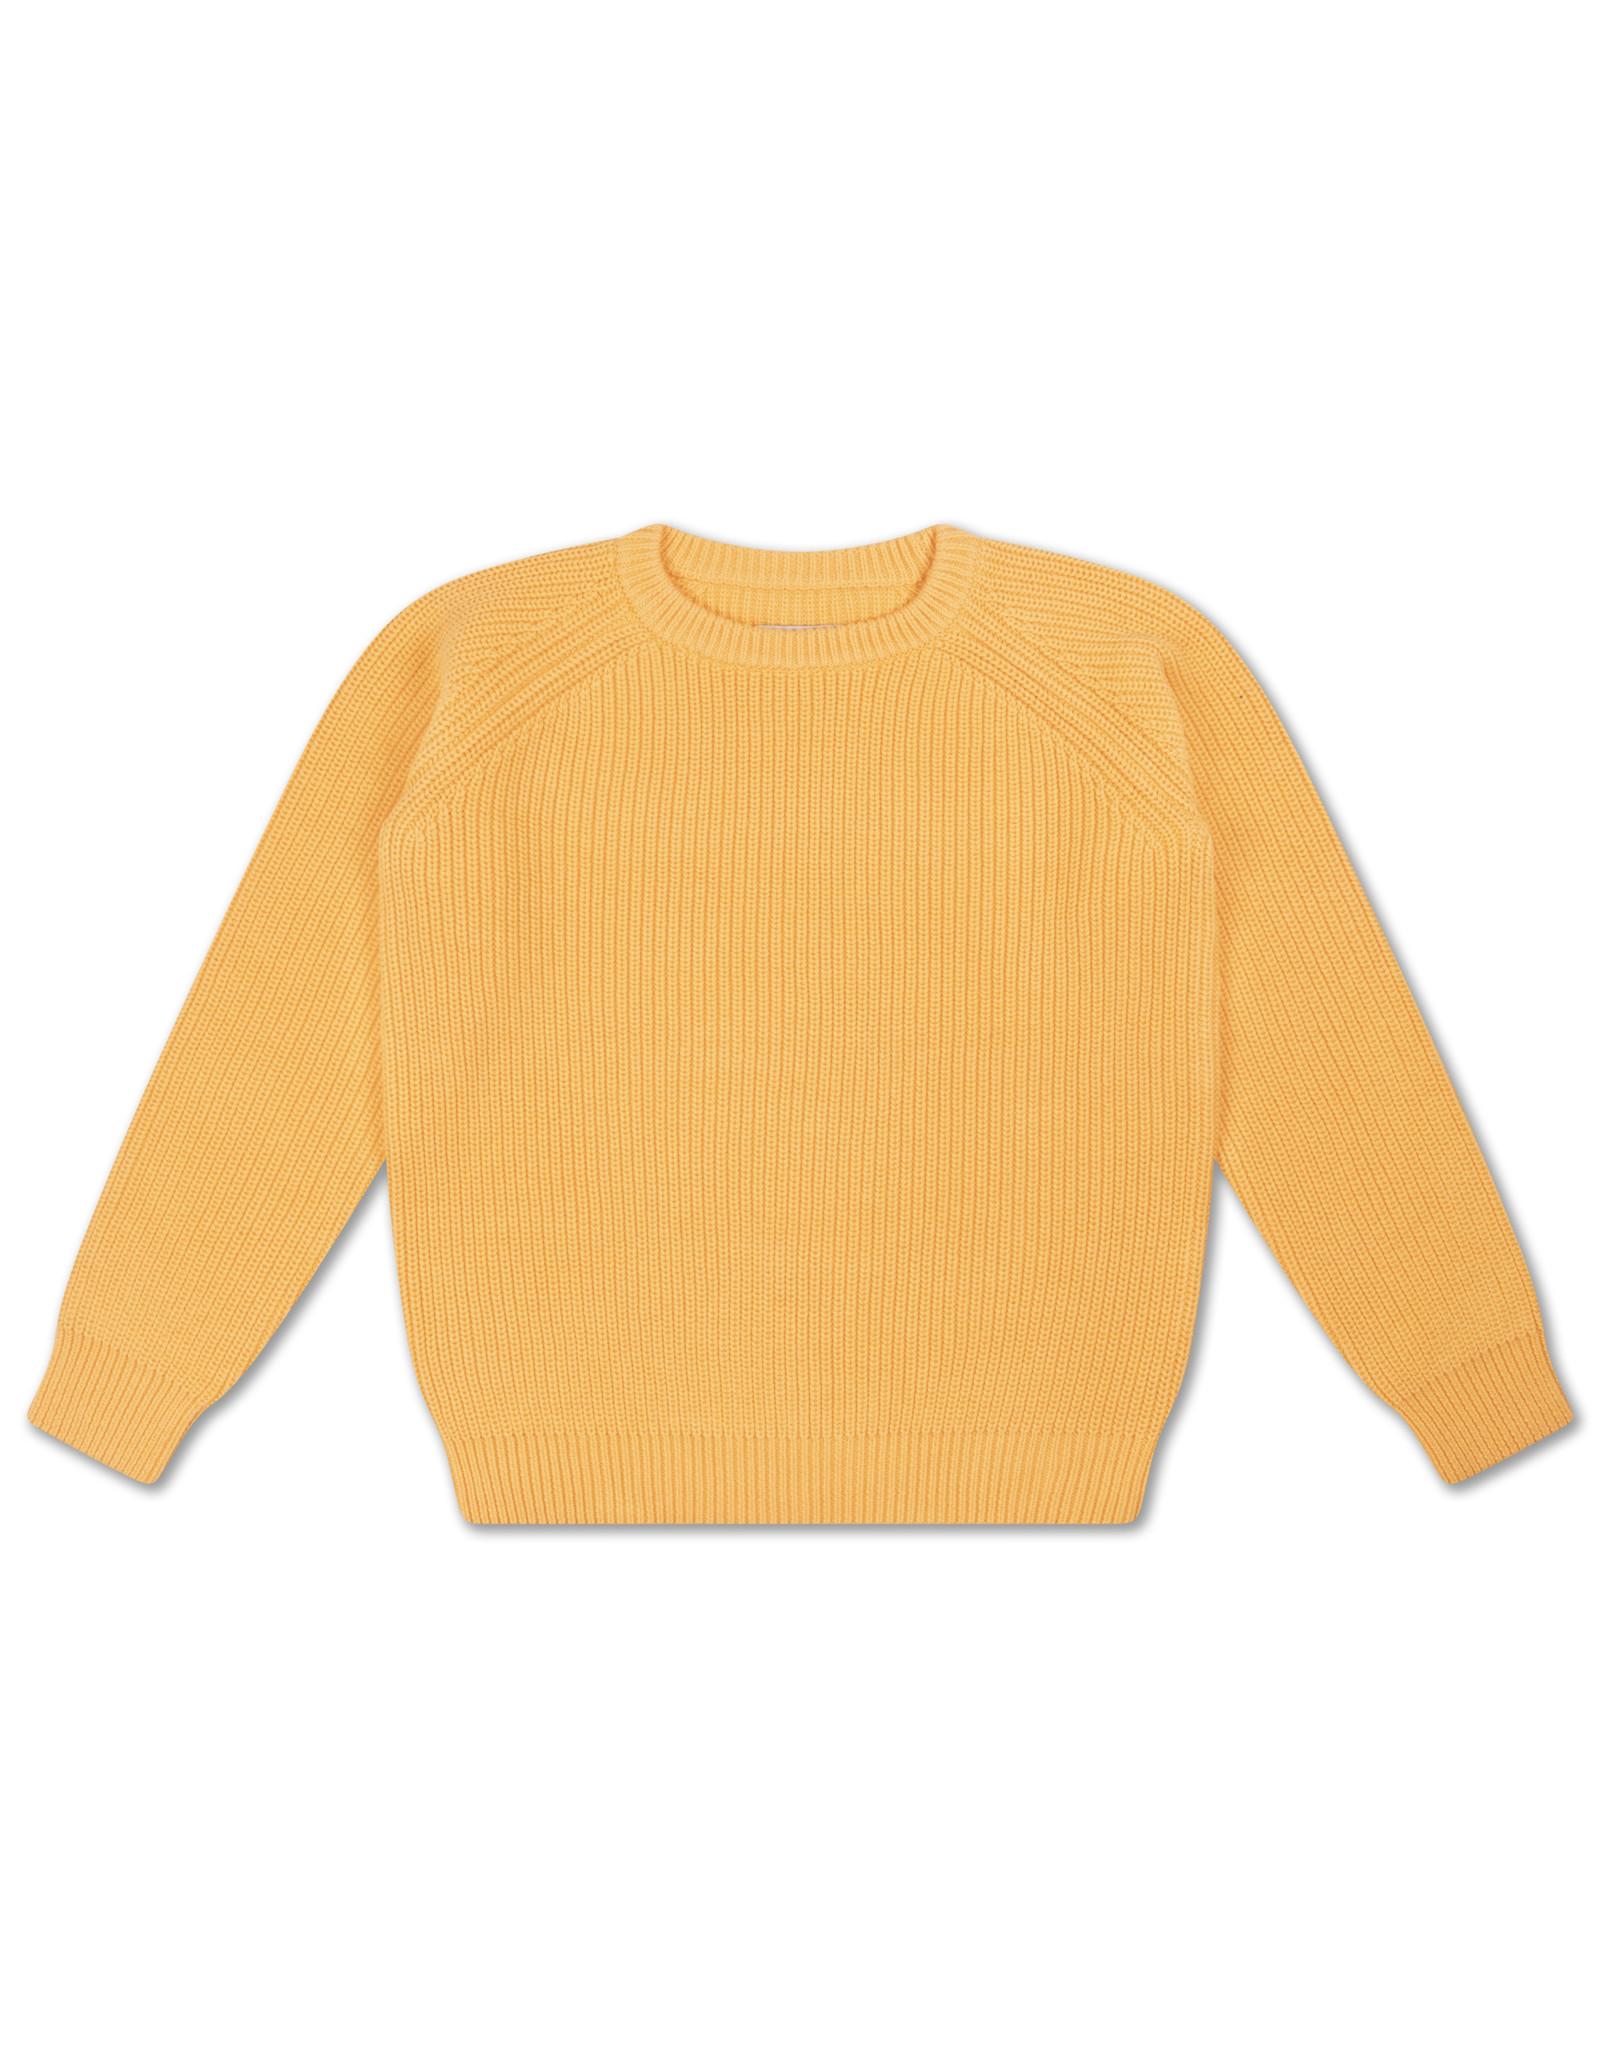 Repose Repose SS21 62 Knit Sweater orange yellow